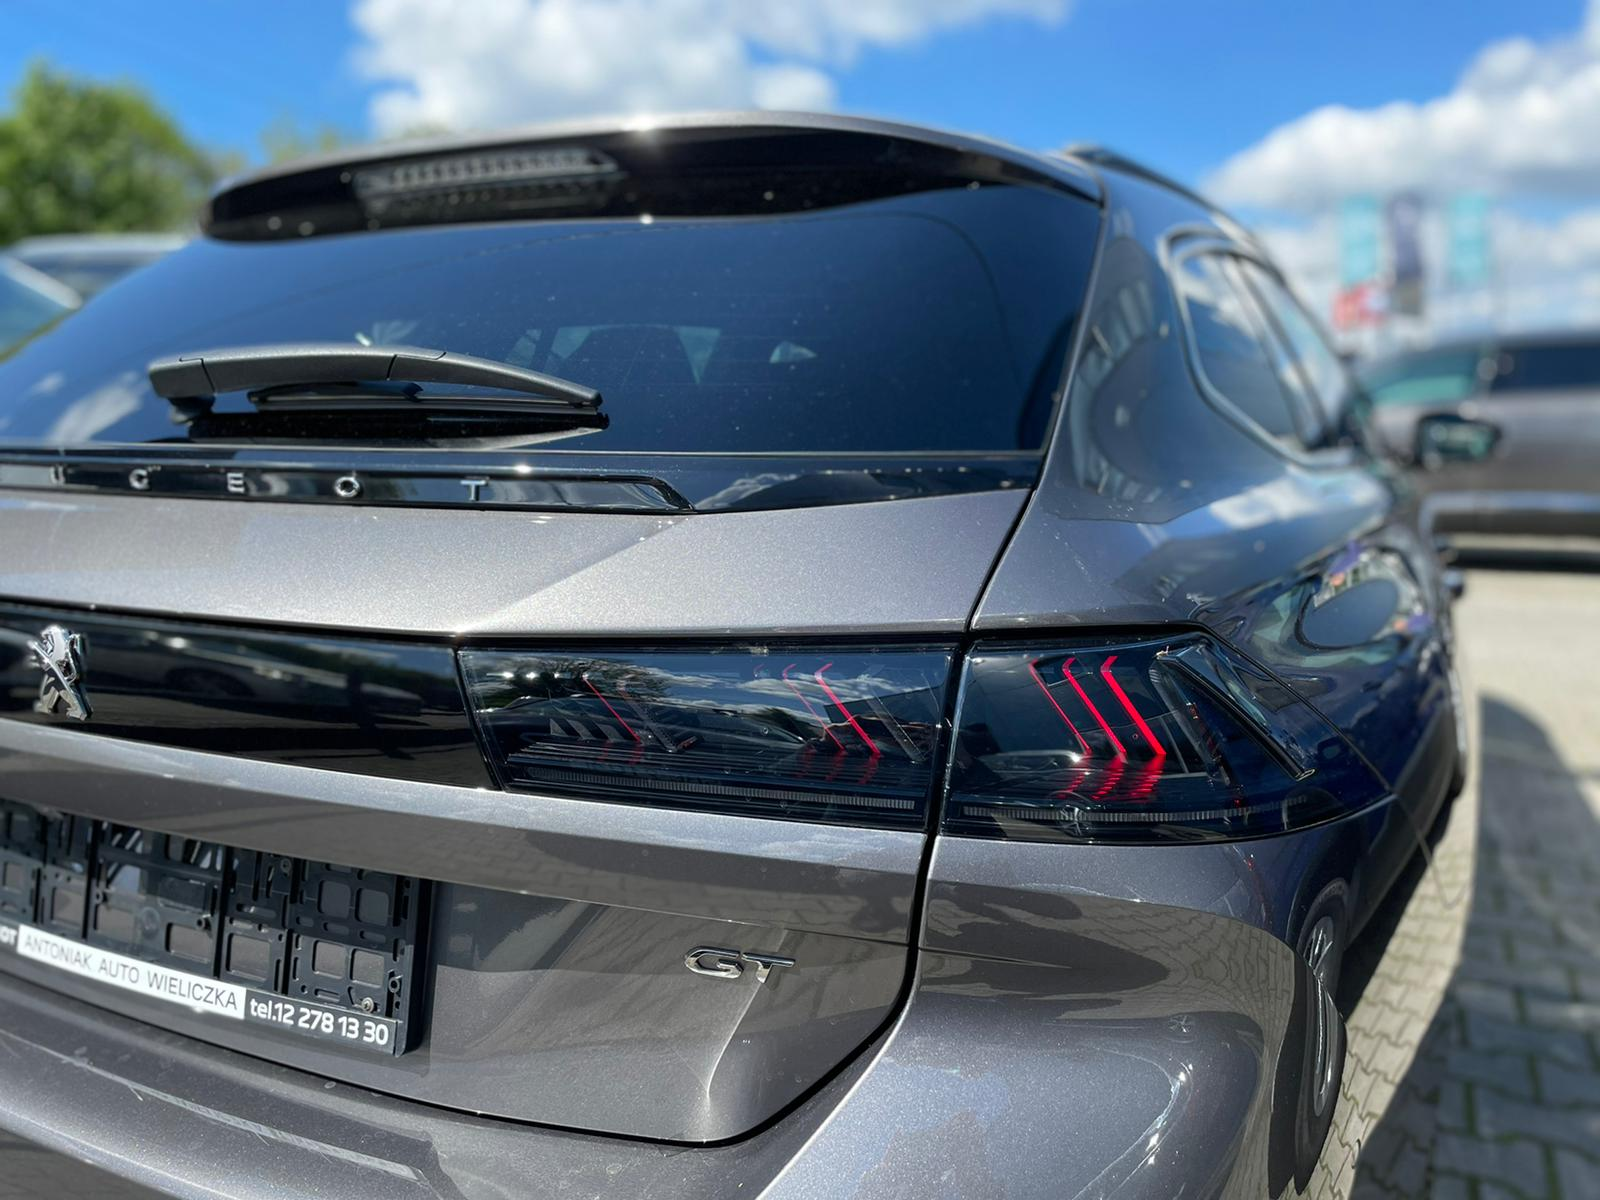 Freemoto - Peugeot 508 1.6